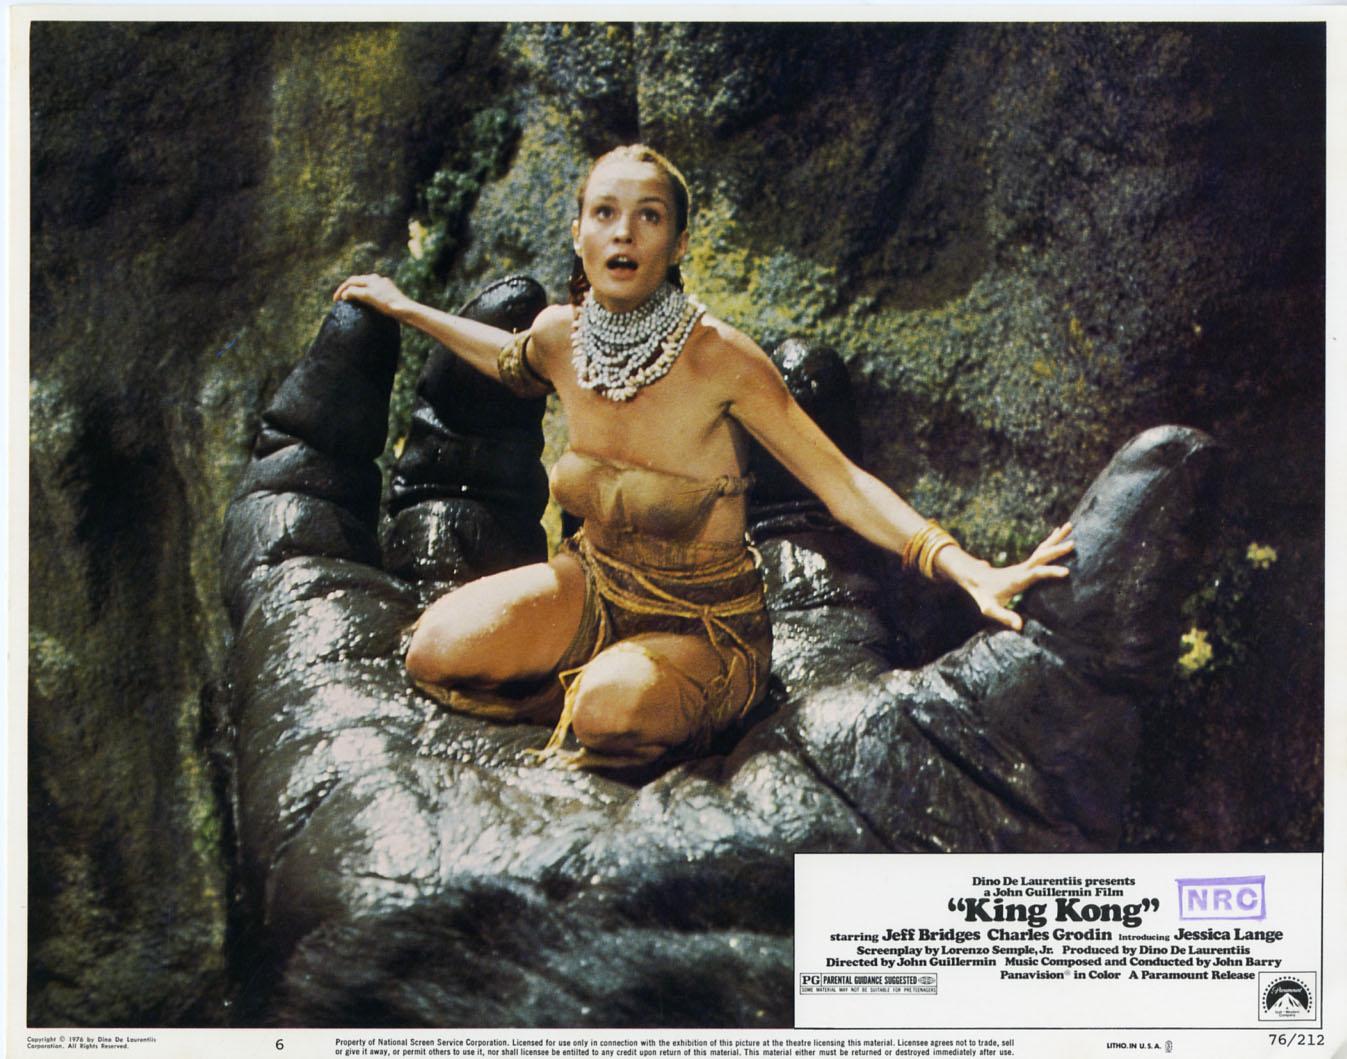 Jessica Lange - Wallpaper